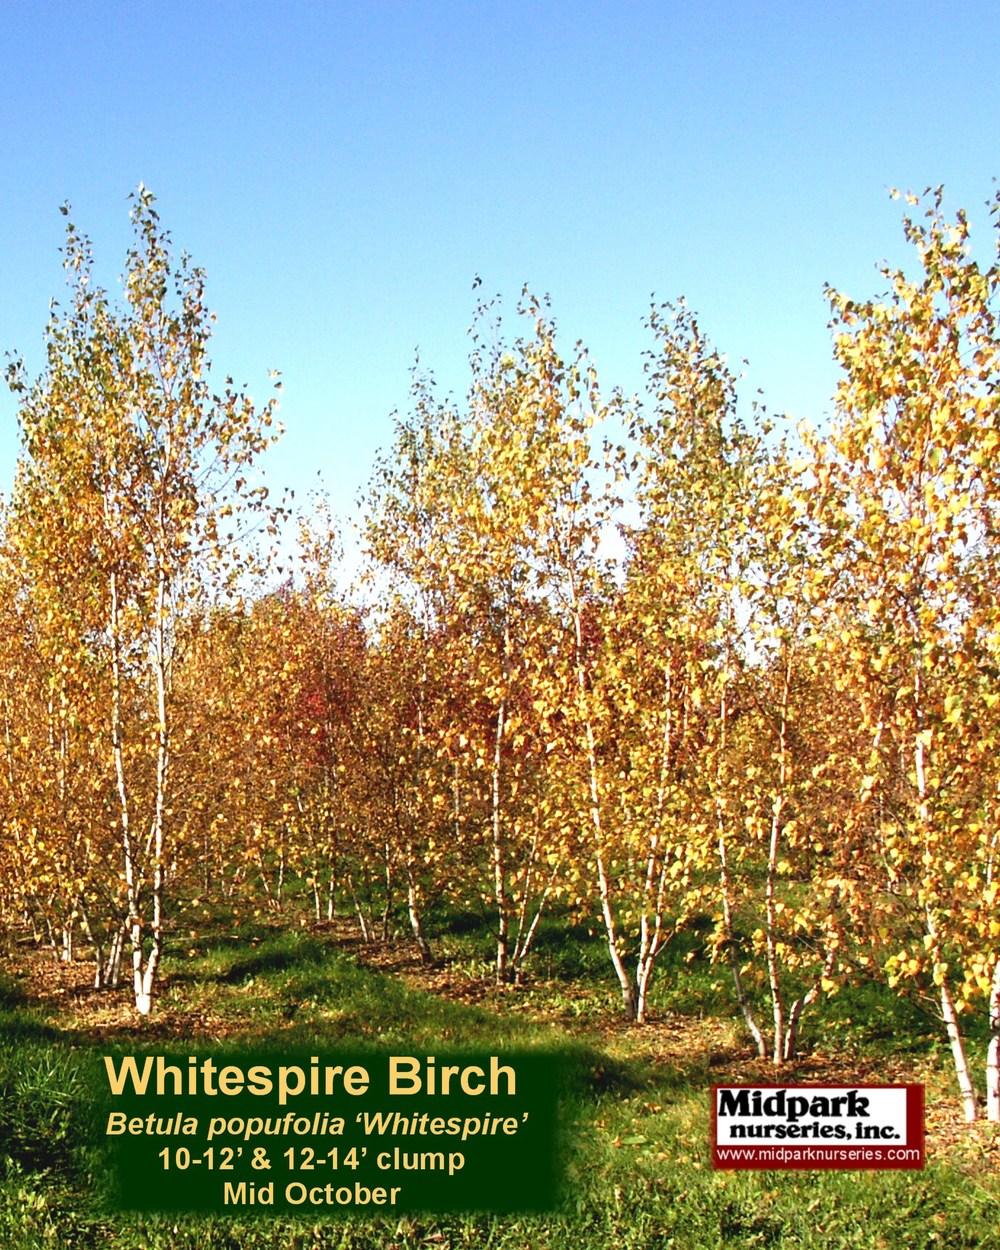 Whitespire_Birch_10to14ft_07_1025_8x10.jpg